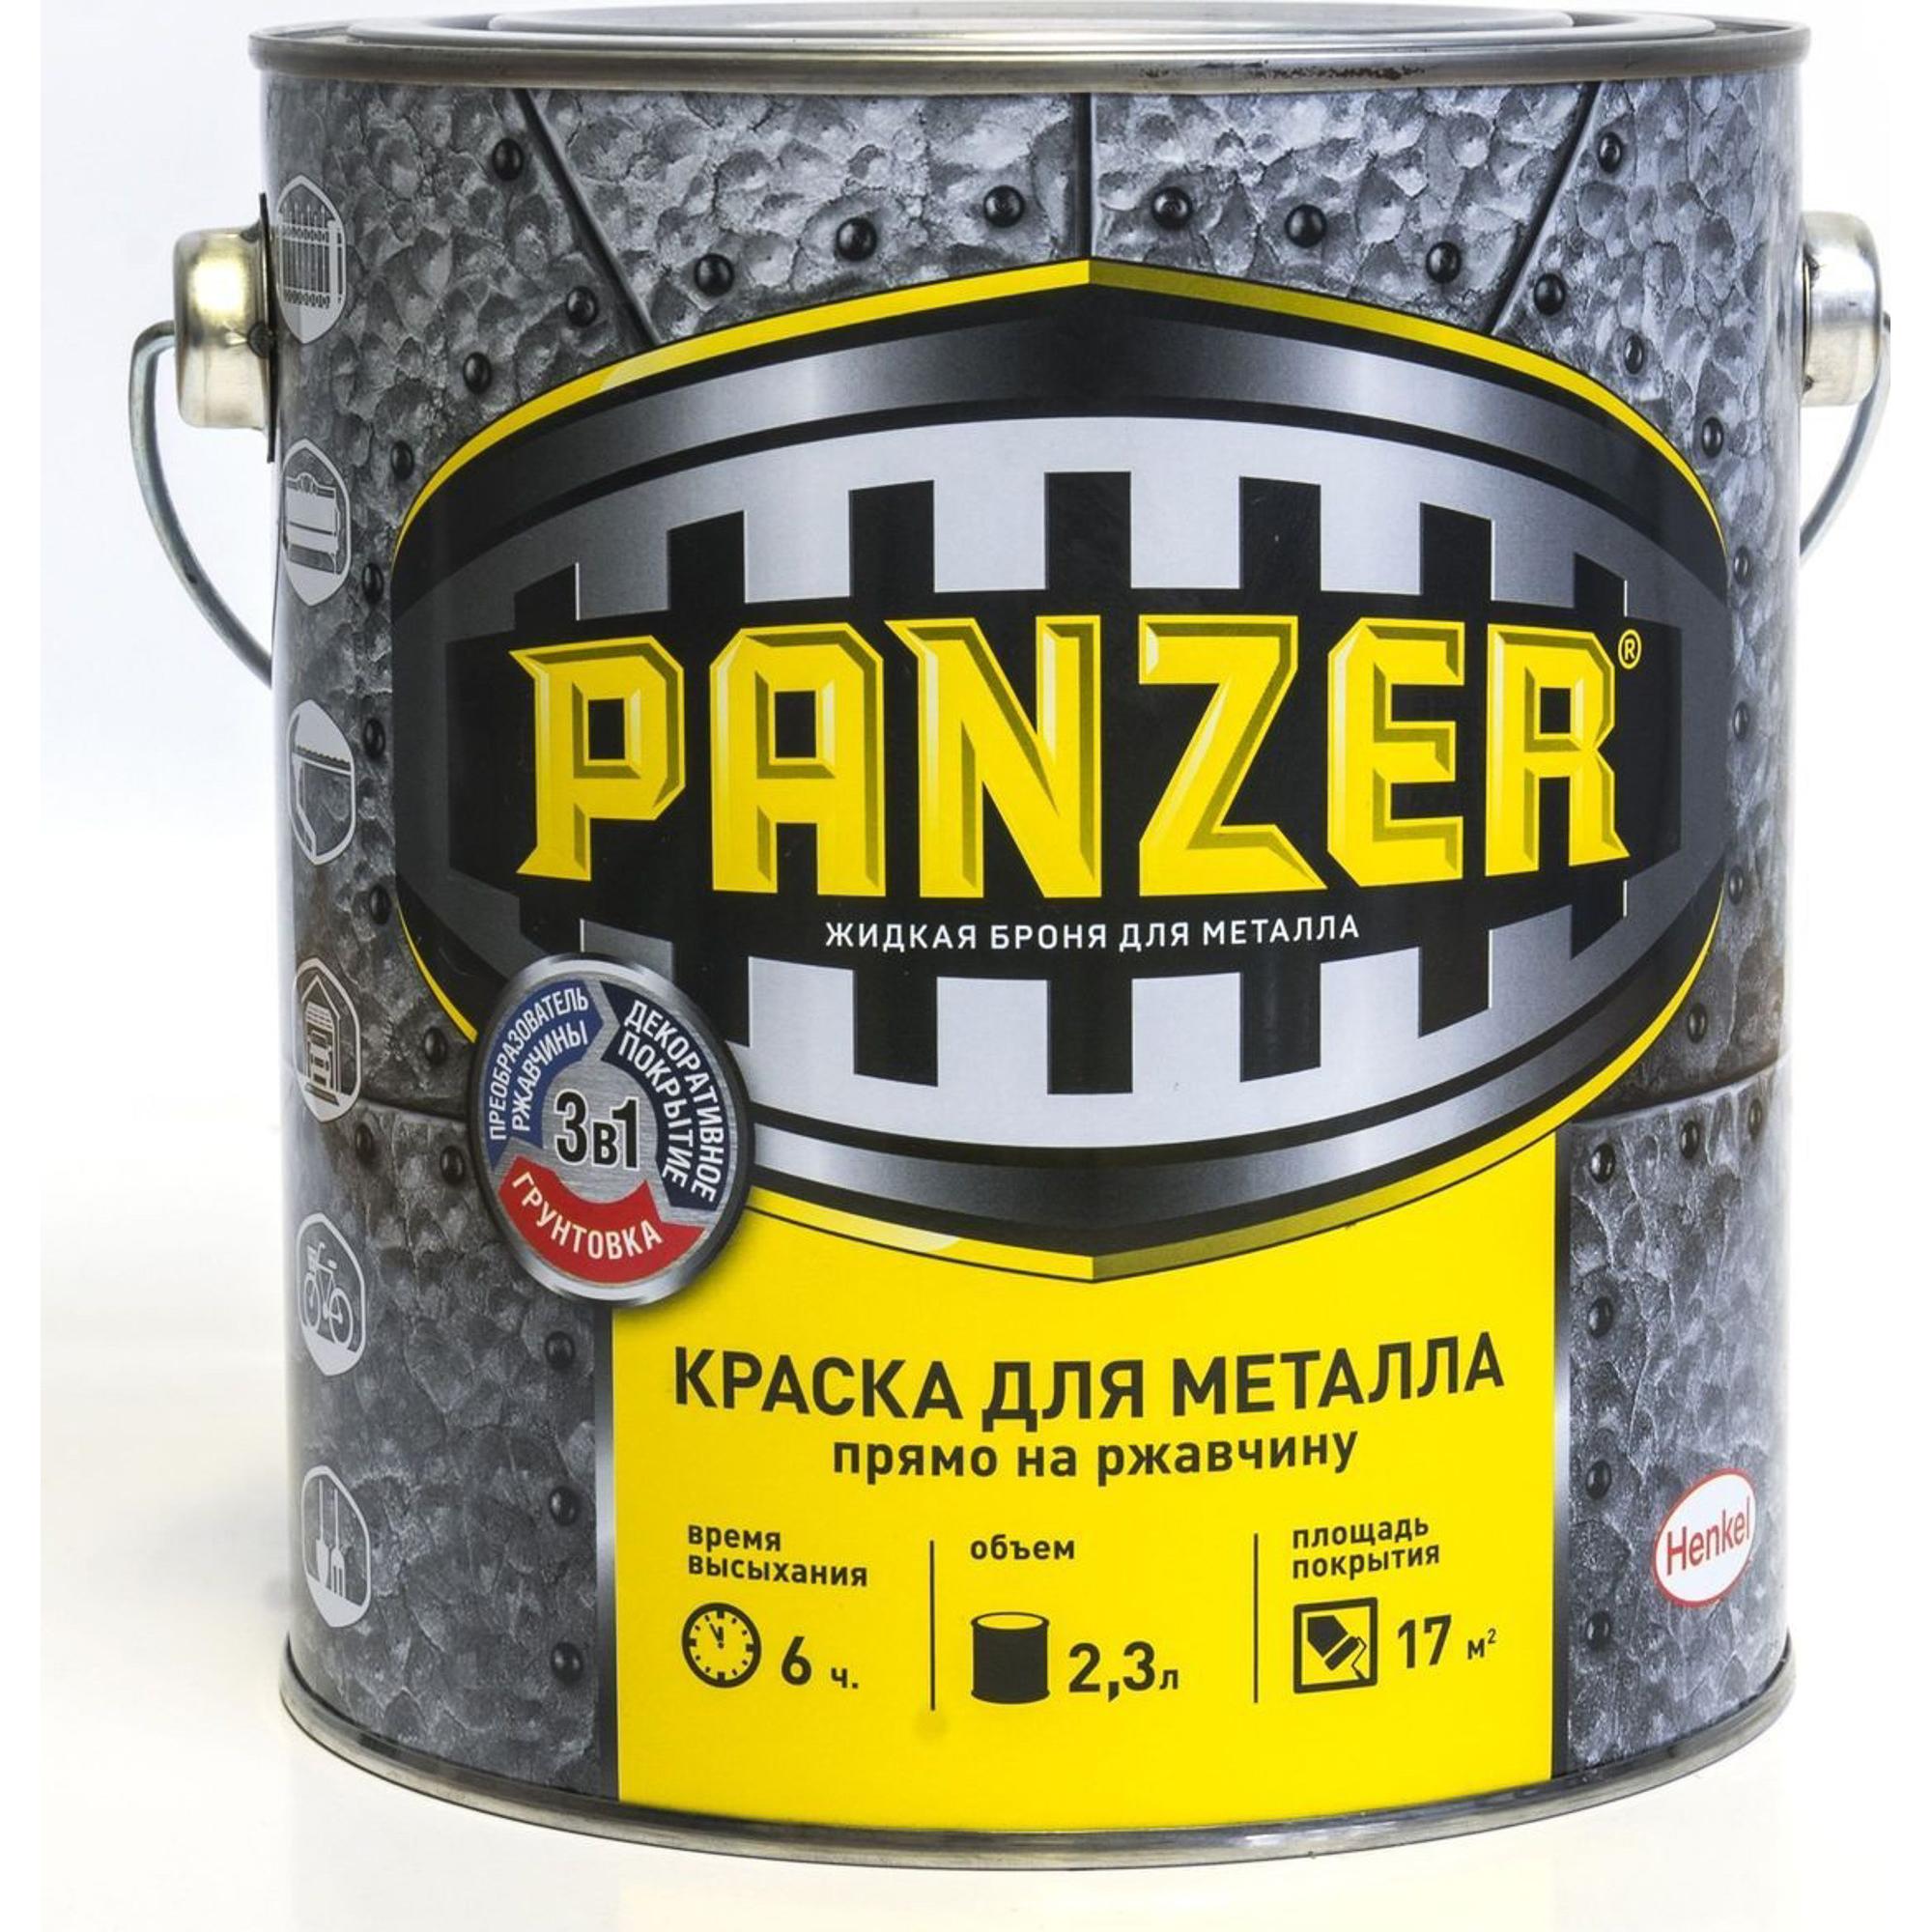 Краска для металла Panzer гладкая желтая 2.3 л недорого